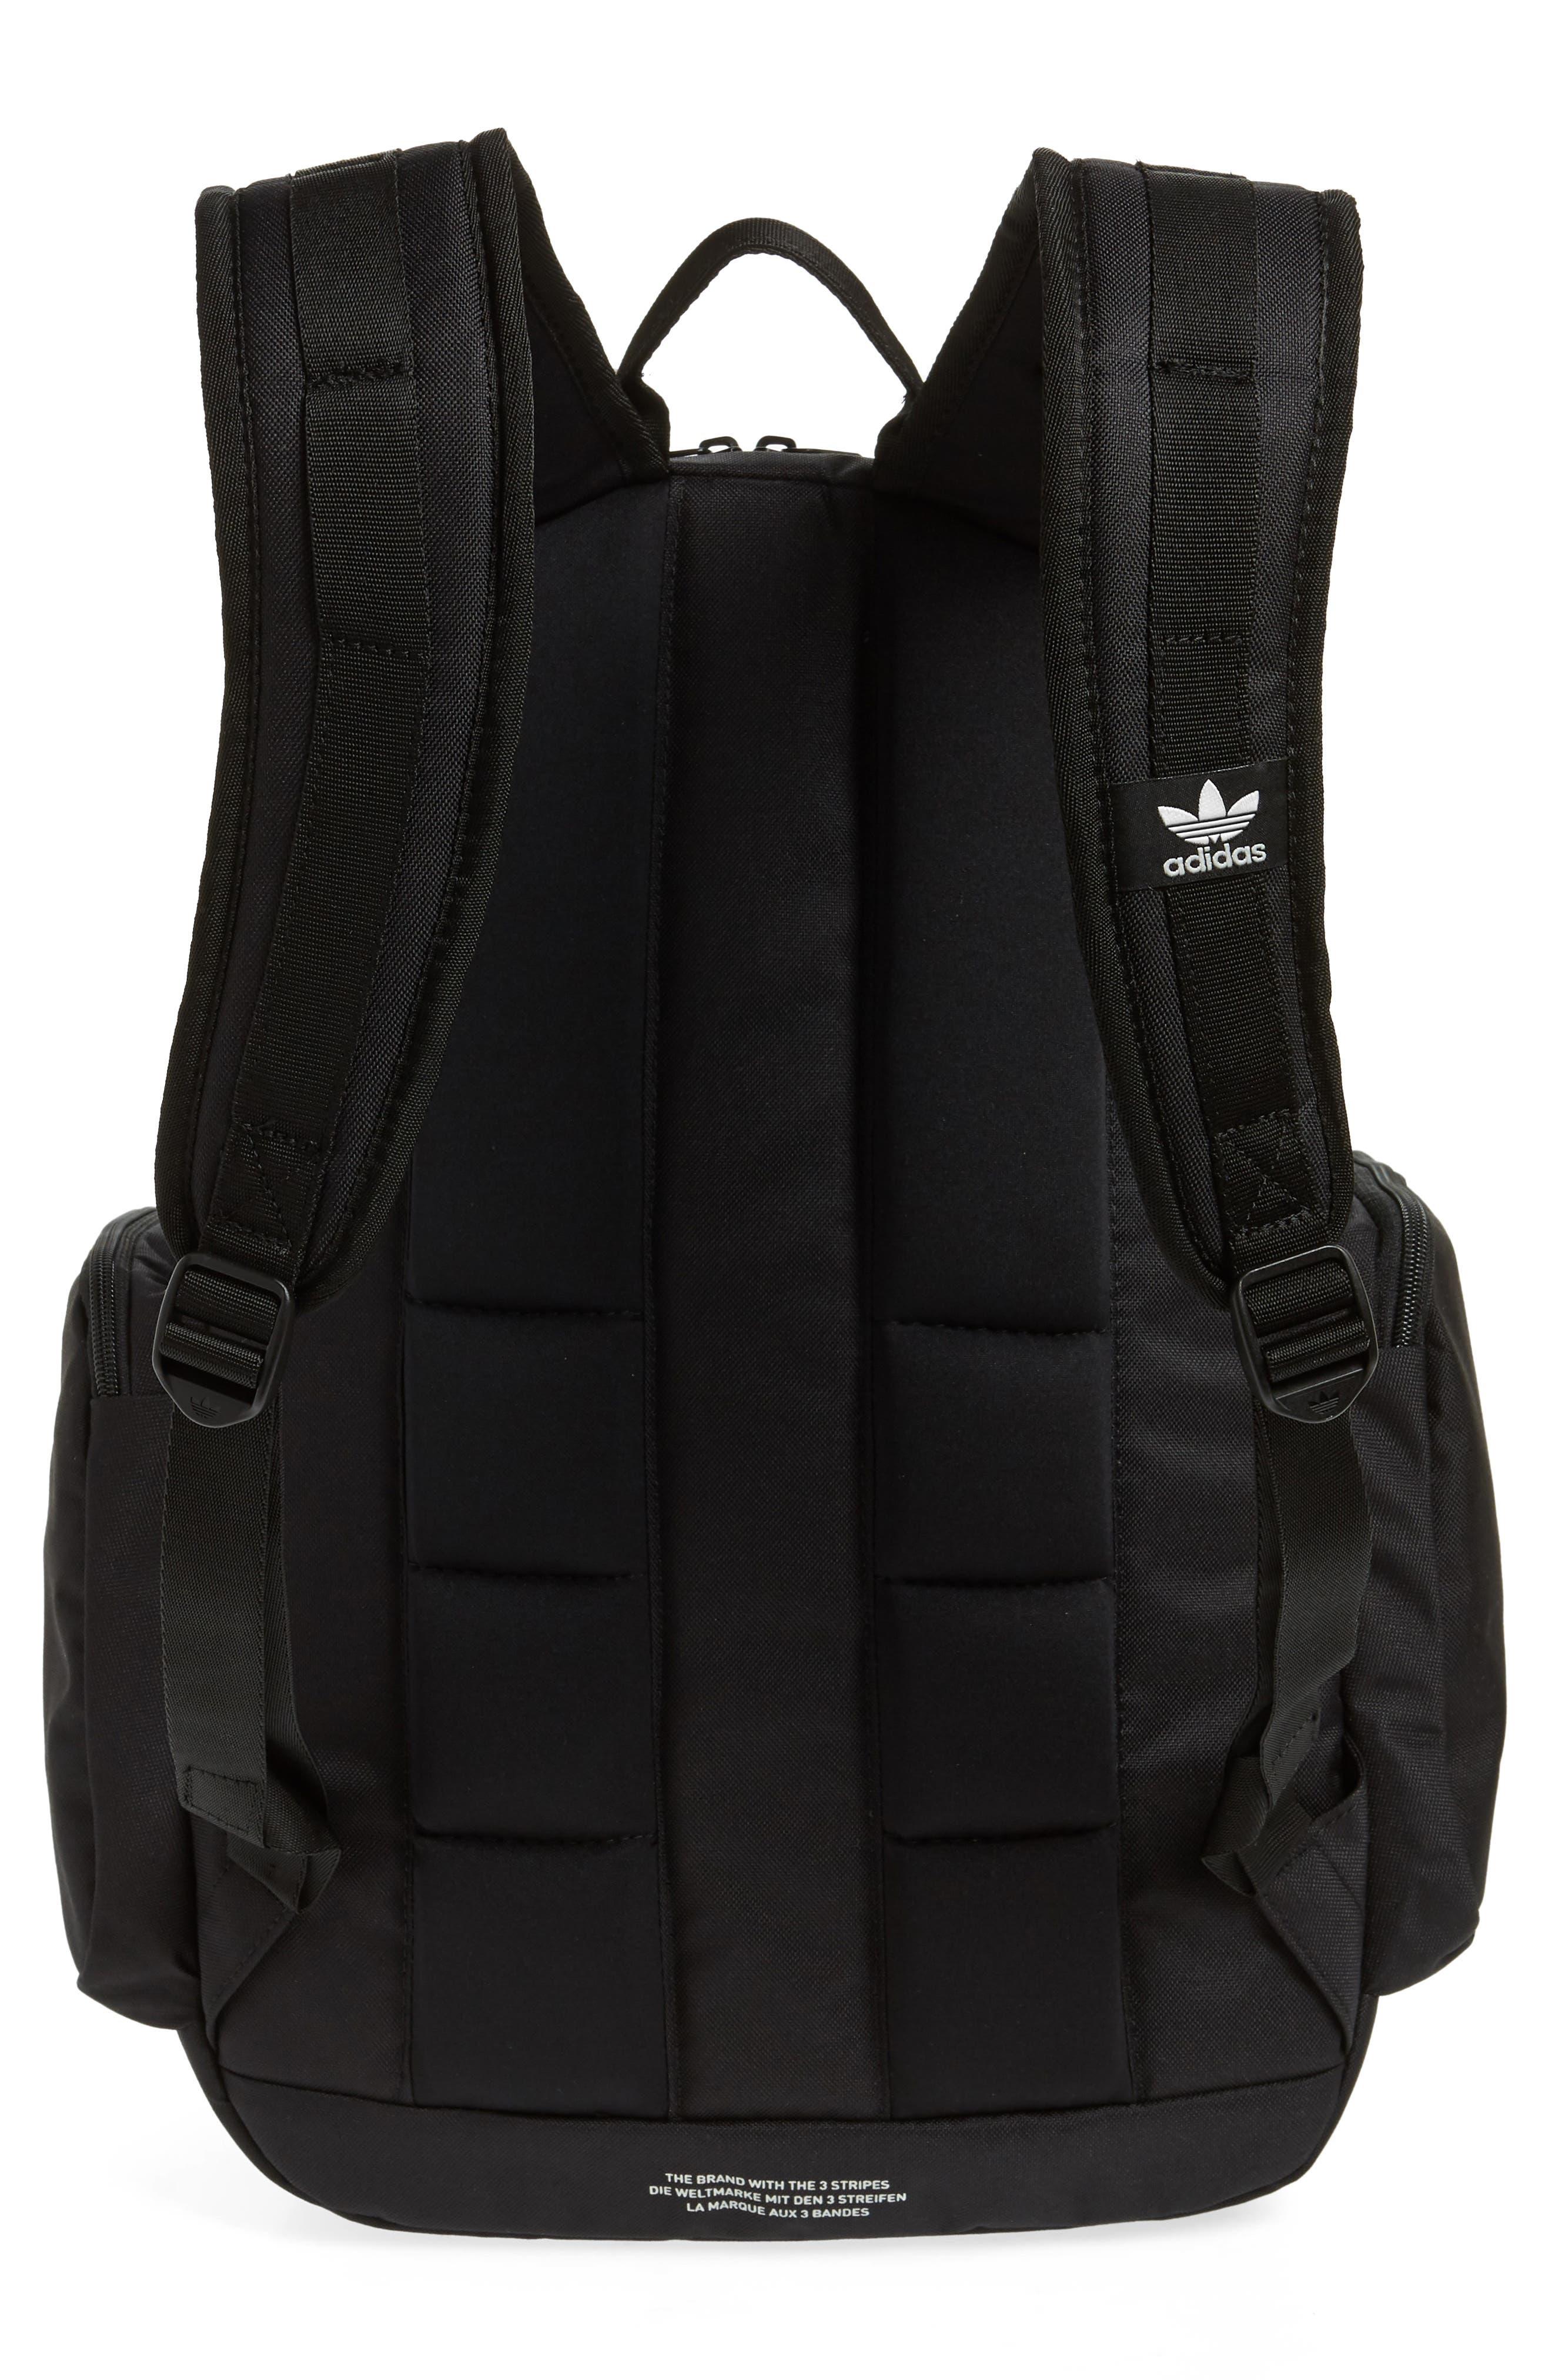 Create III Backpack,                             Alternate thumbnail 3, color,                             BLACK/ RAW DESERT KHAKI